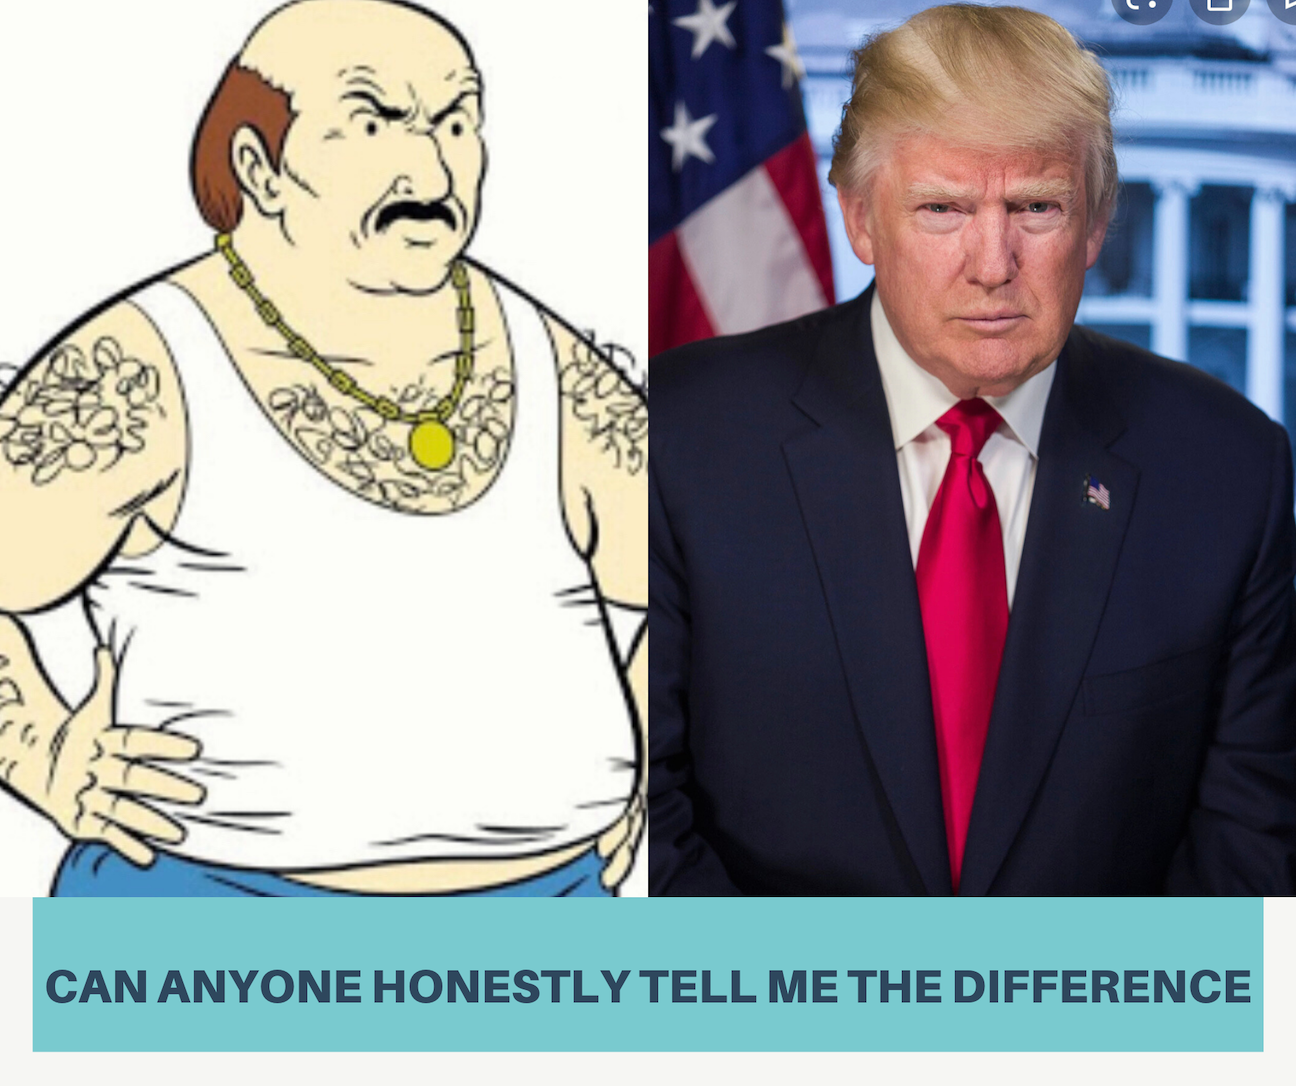 Carl is Trump